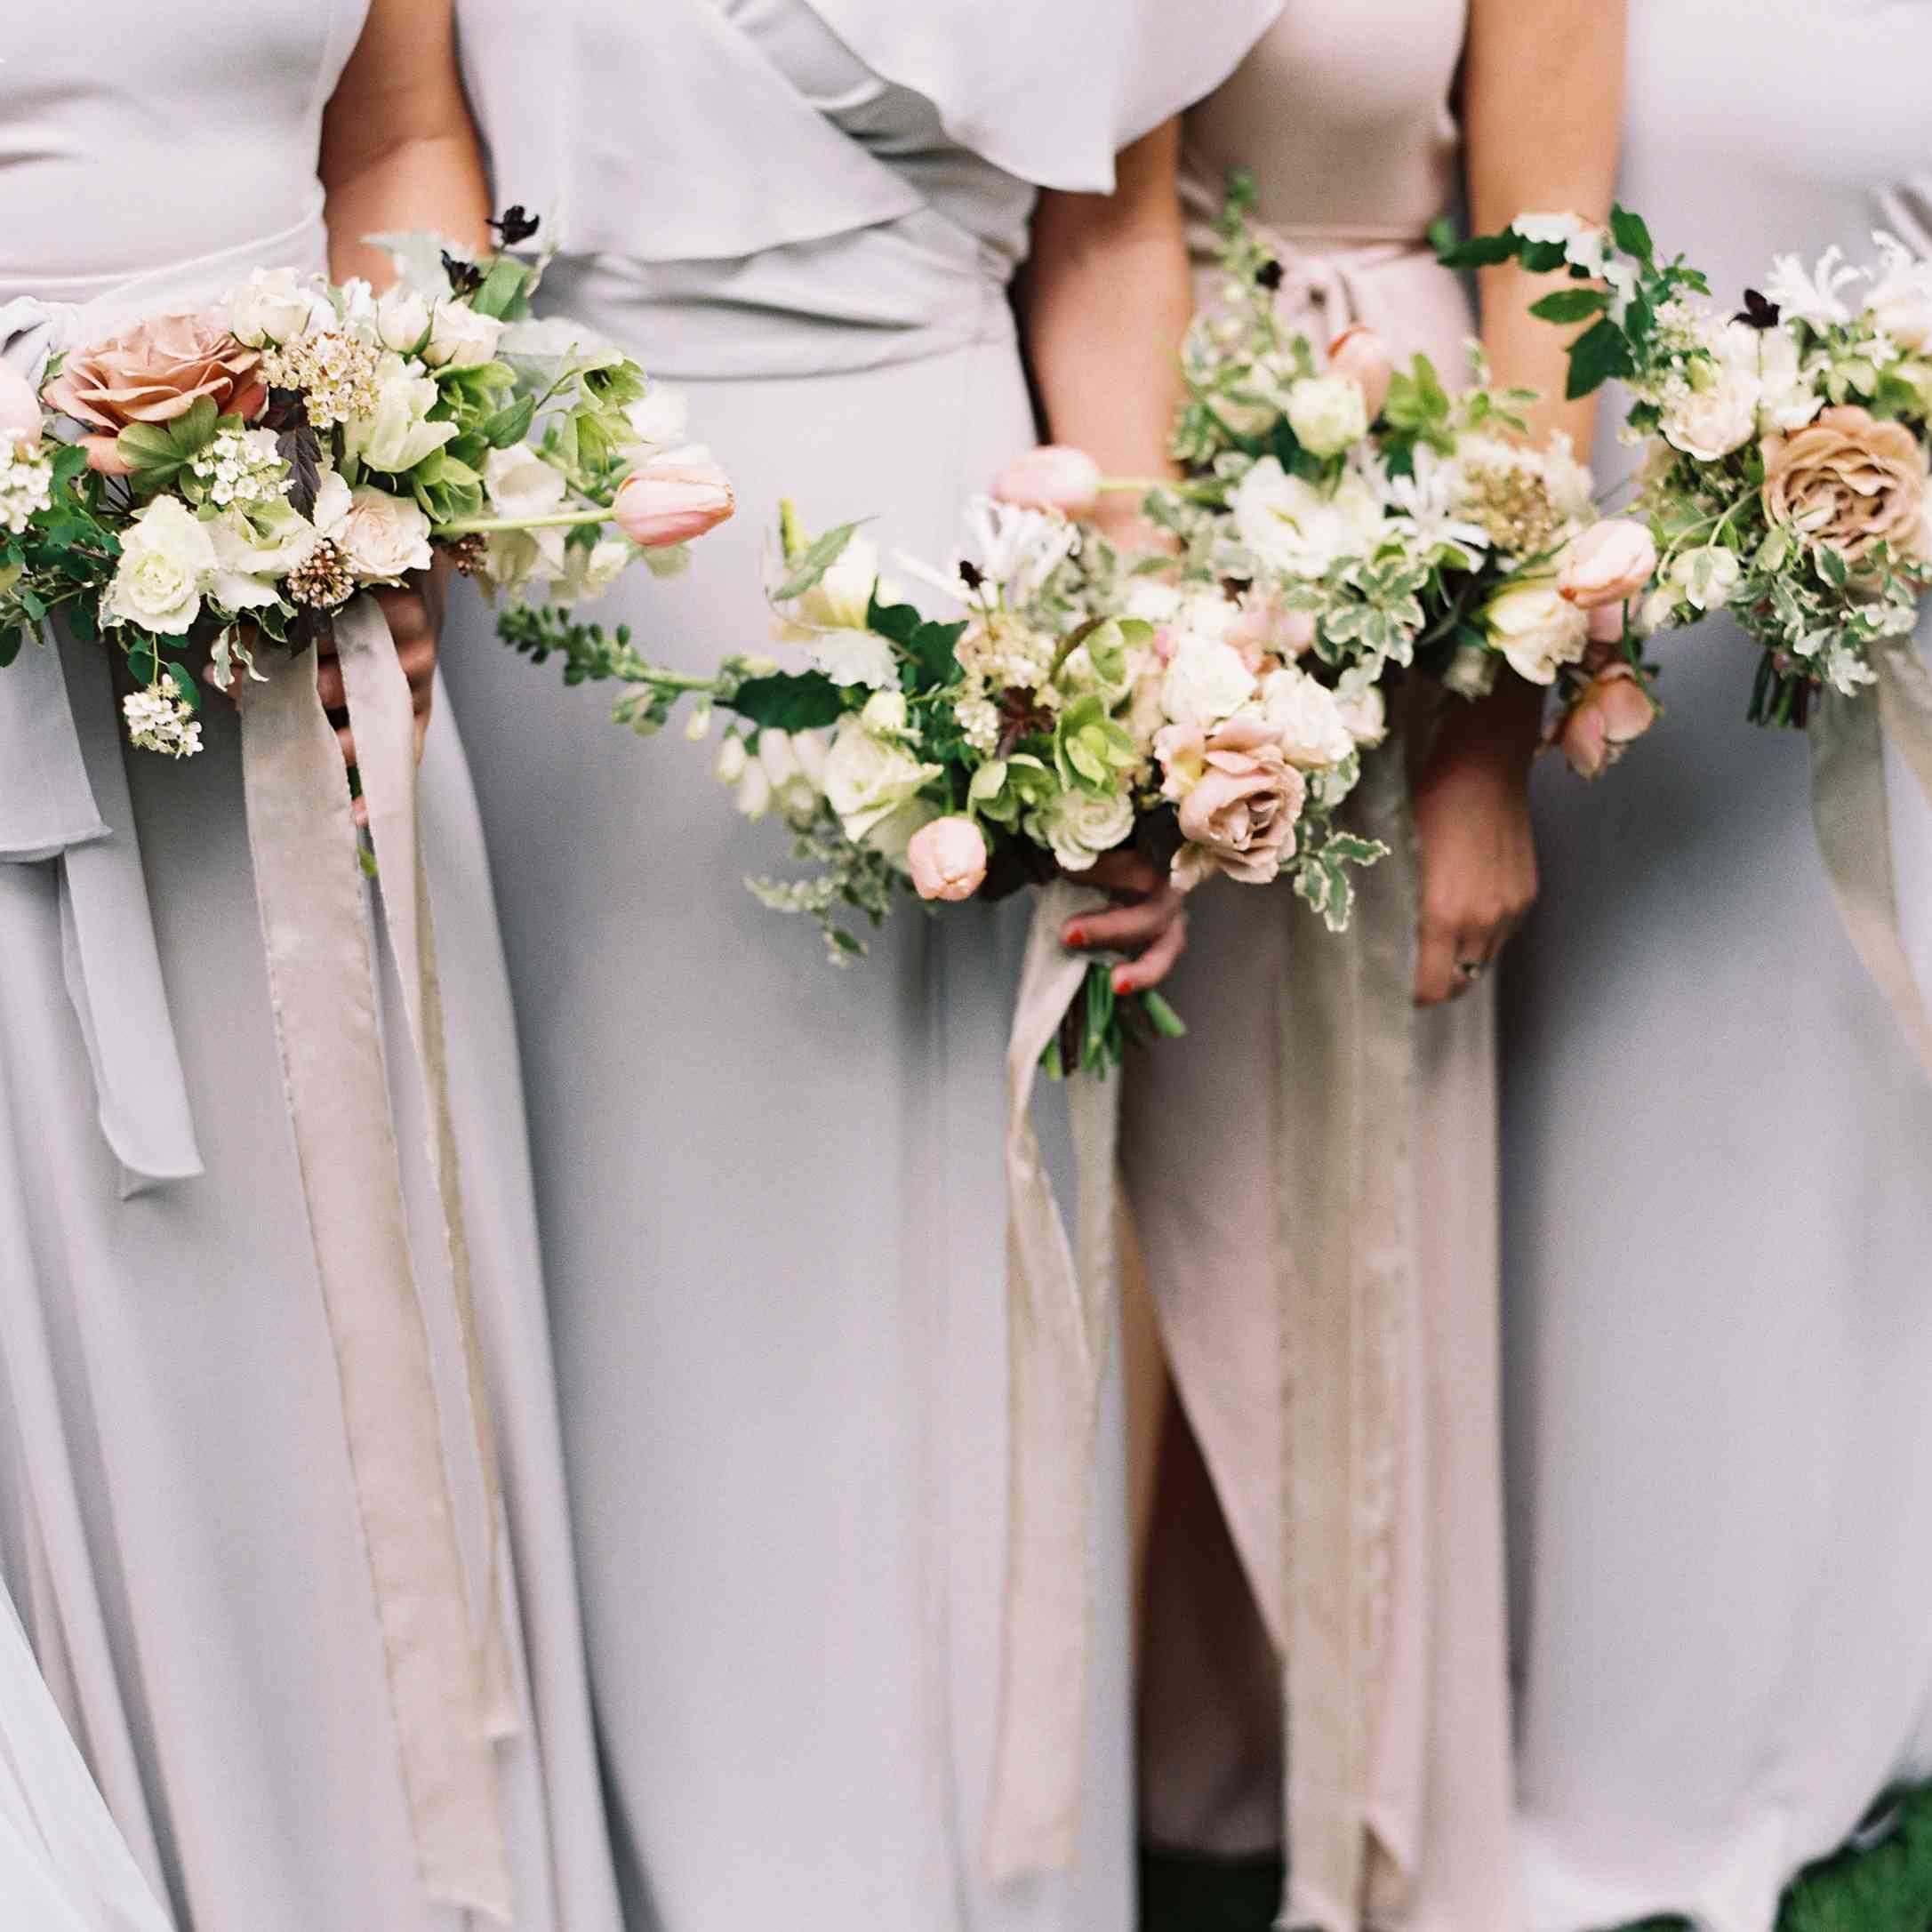 Bride with bridesmaids bouquets